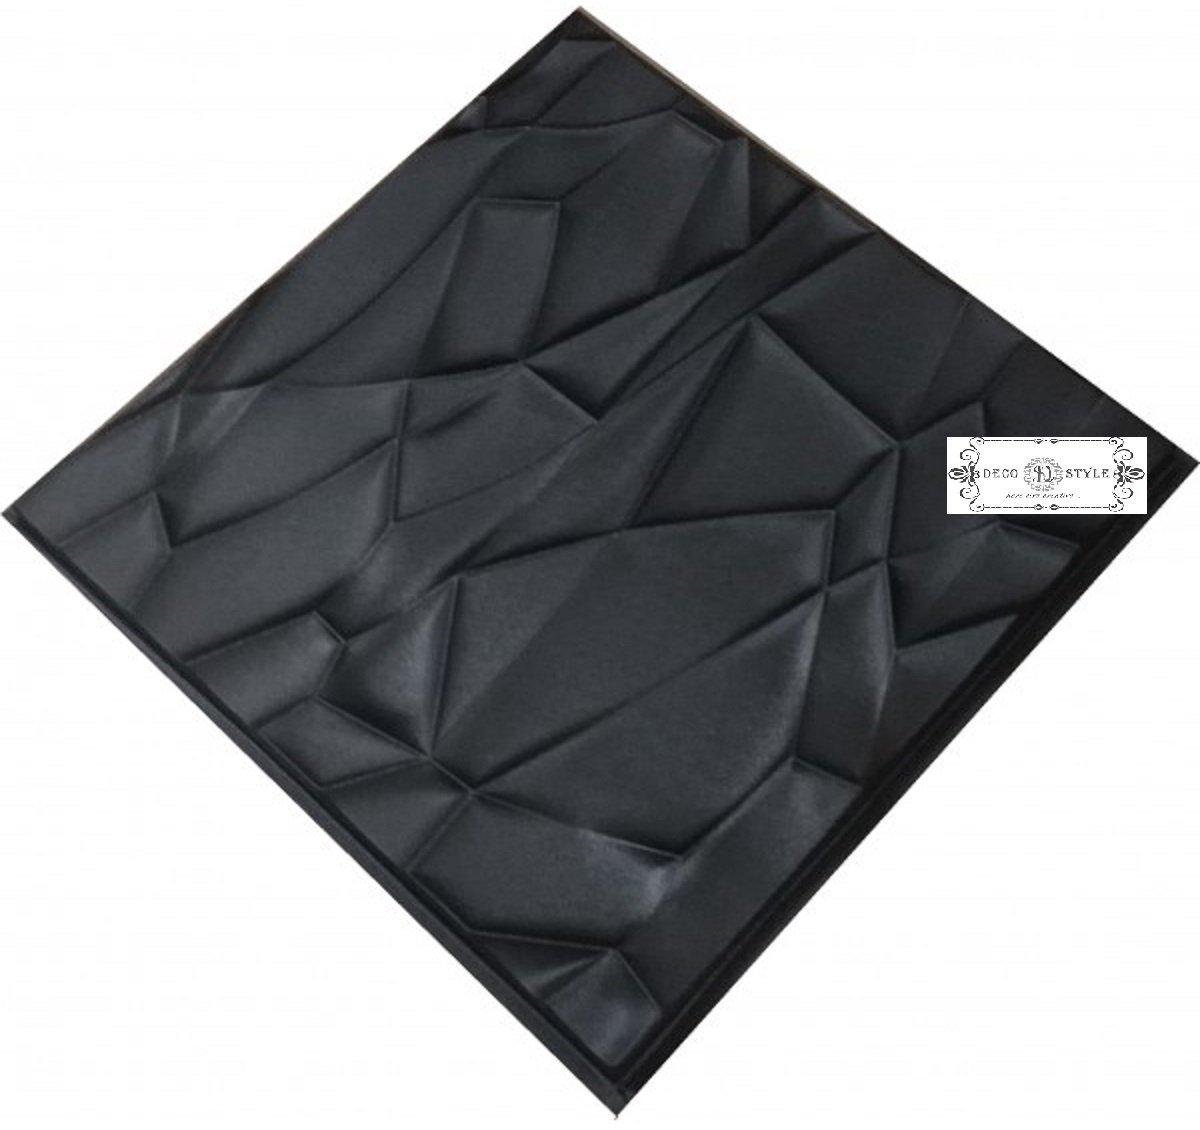 Rock Plastic Molds For 3 D Panels Plaster Wall Stone Form 3D Decor Wall Panels Art Decor Decorative Wall Tile Panels